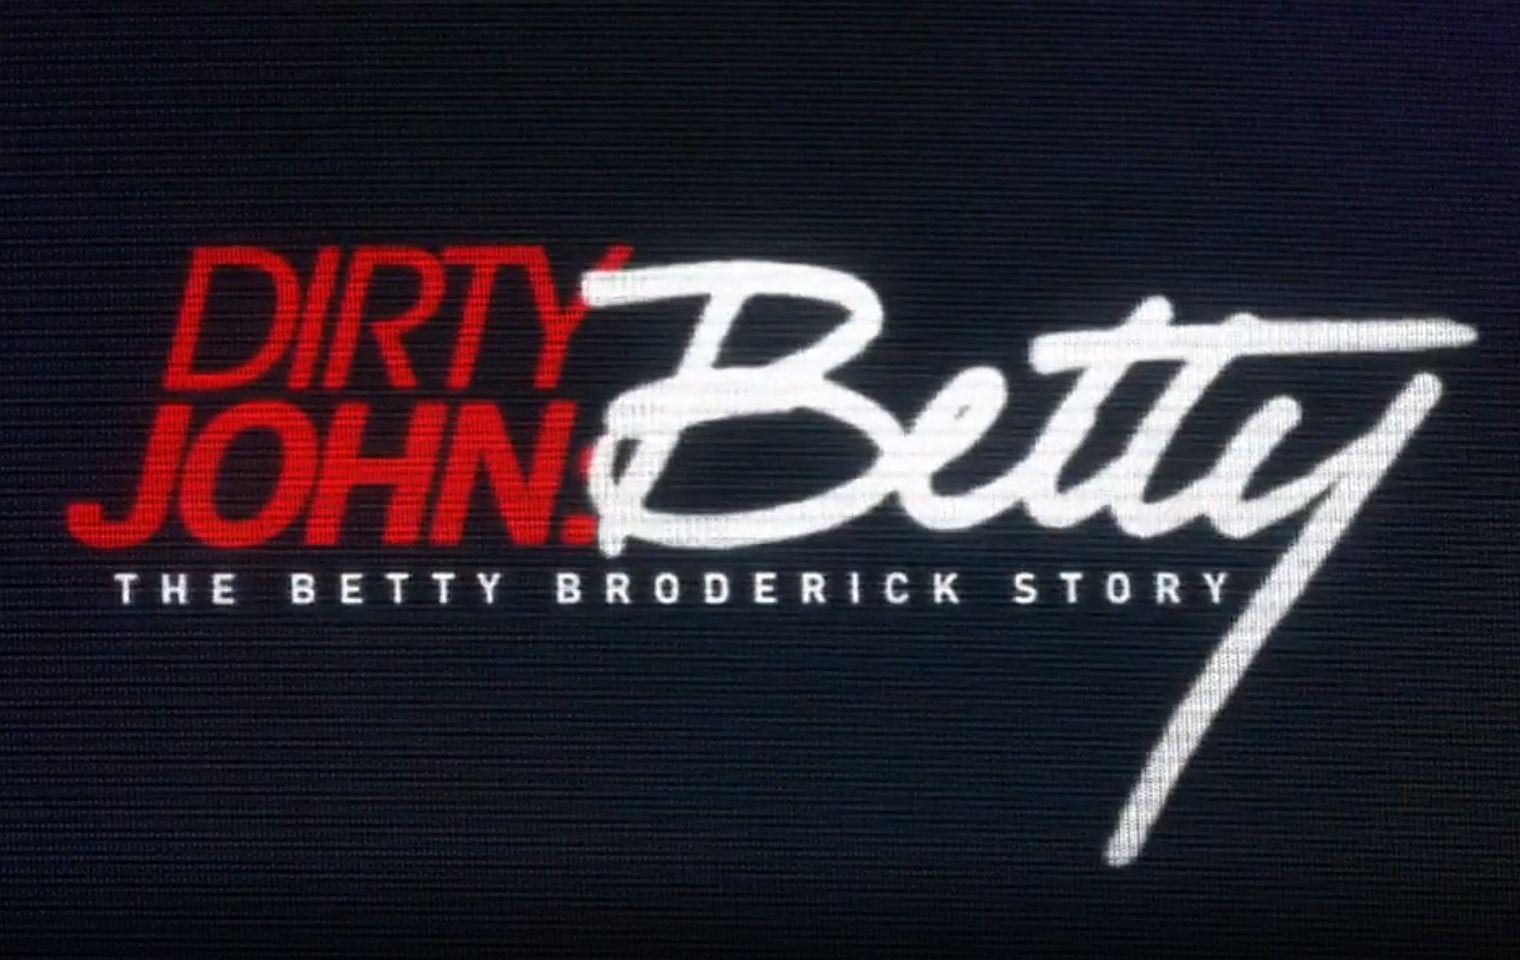 """Dirty John"" - Staffel 2: Start, Handlung, Darsteller*innen, Trailer von ""The Betty Broderick Story"""